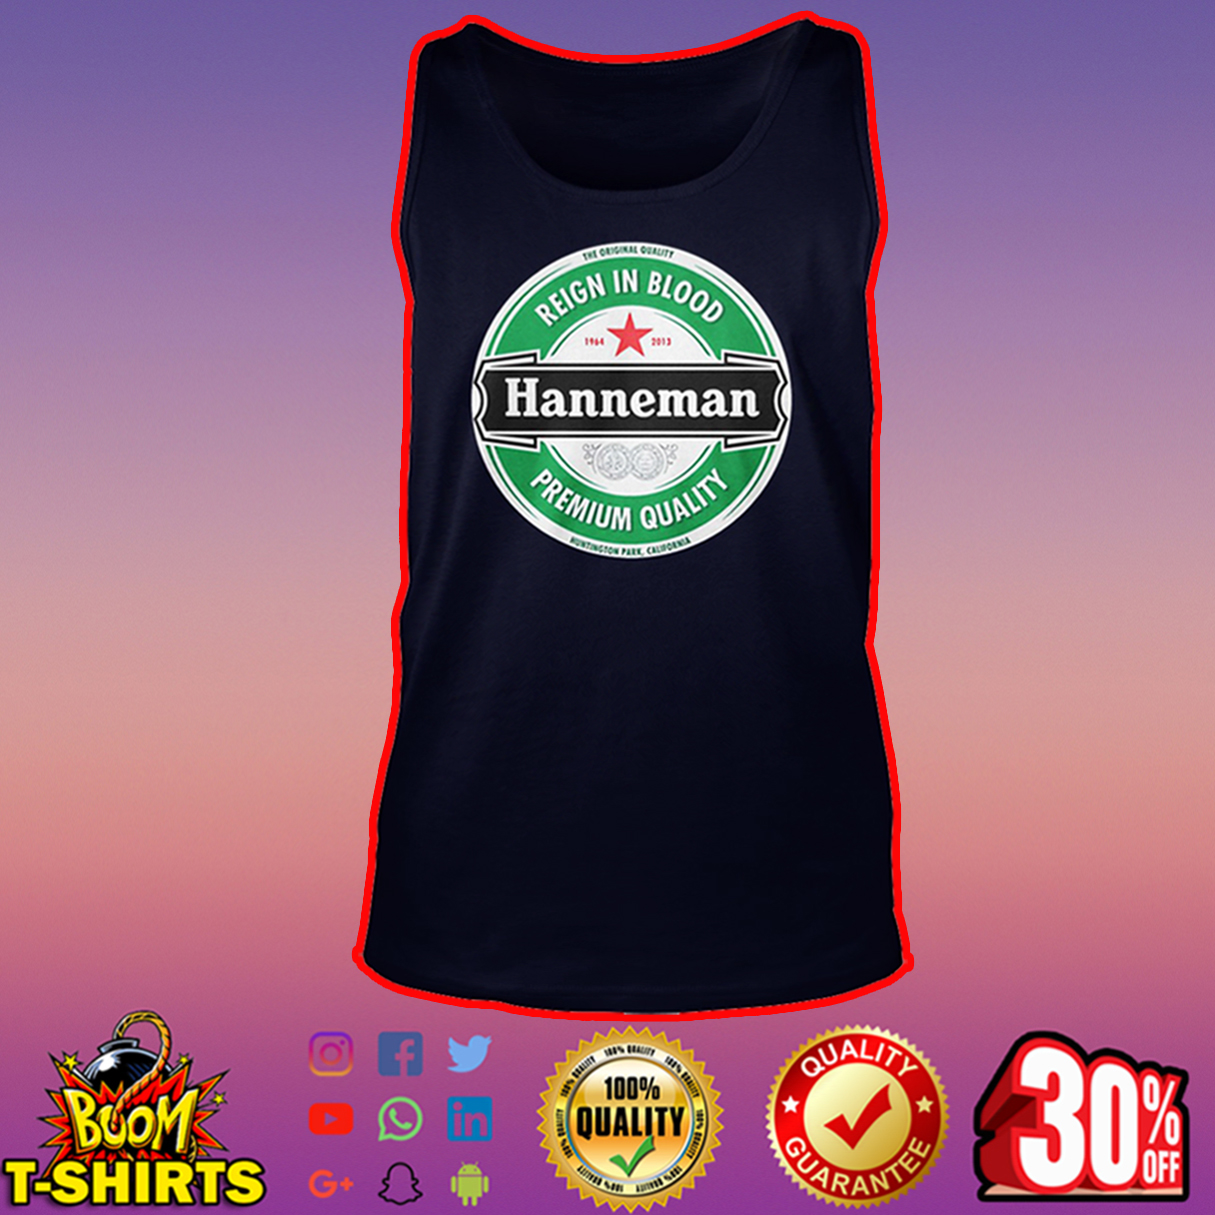 Hanneman reign in blood premium quality tank top